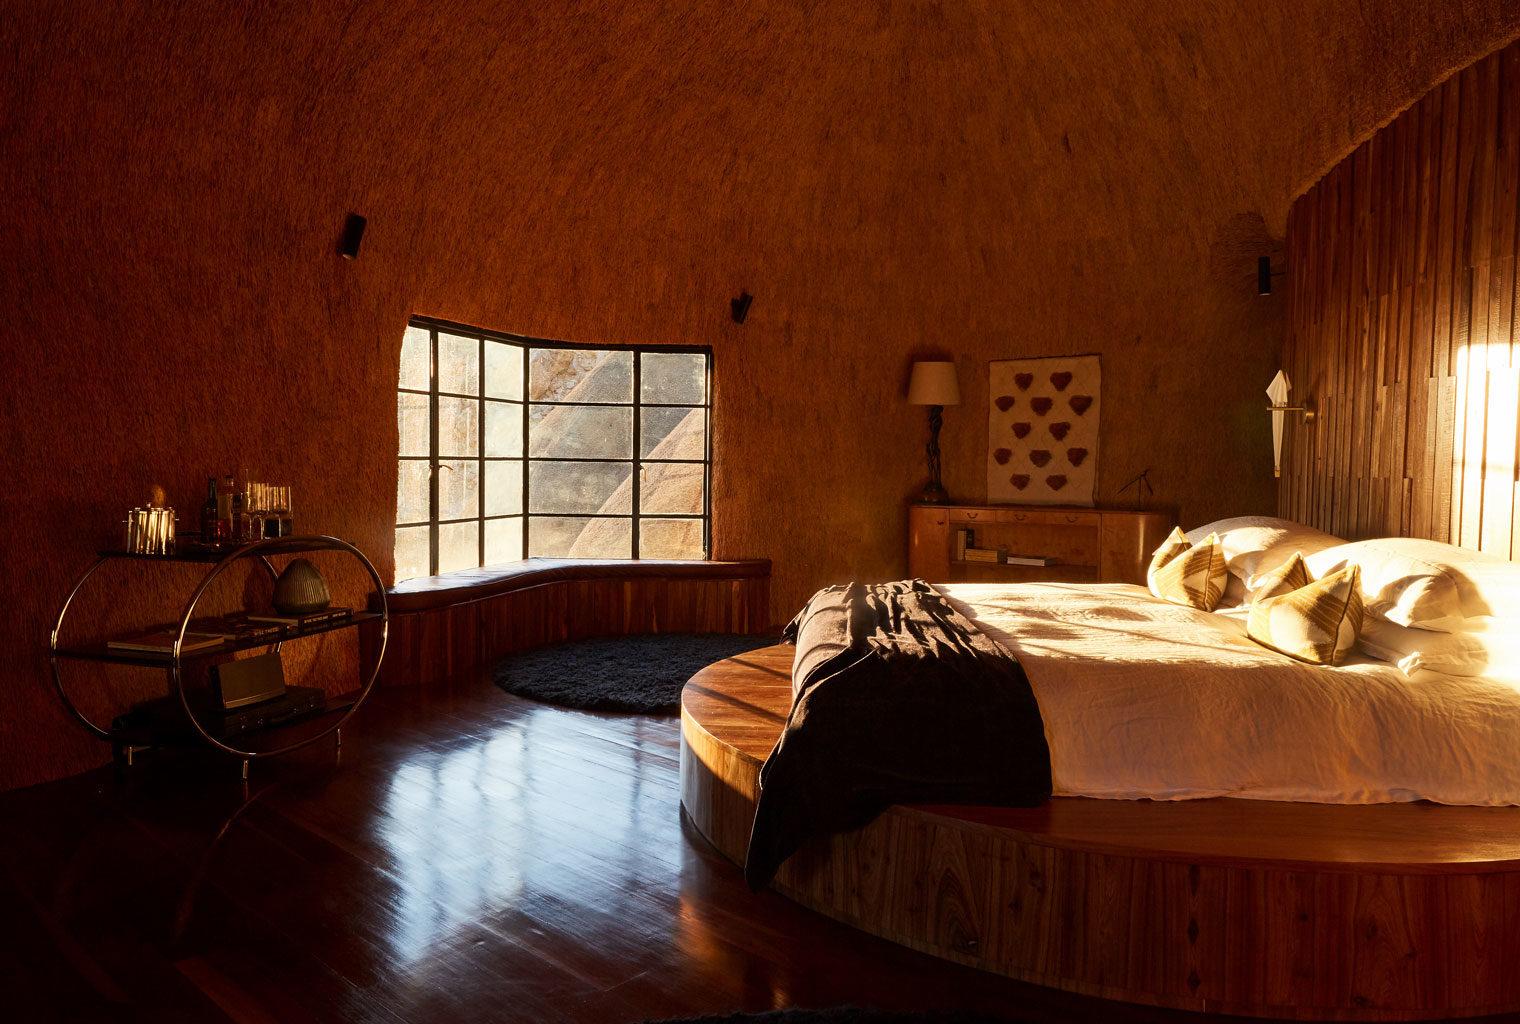 The-Nest-Bedroom-Neuhof-Namibia